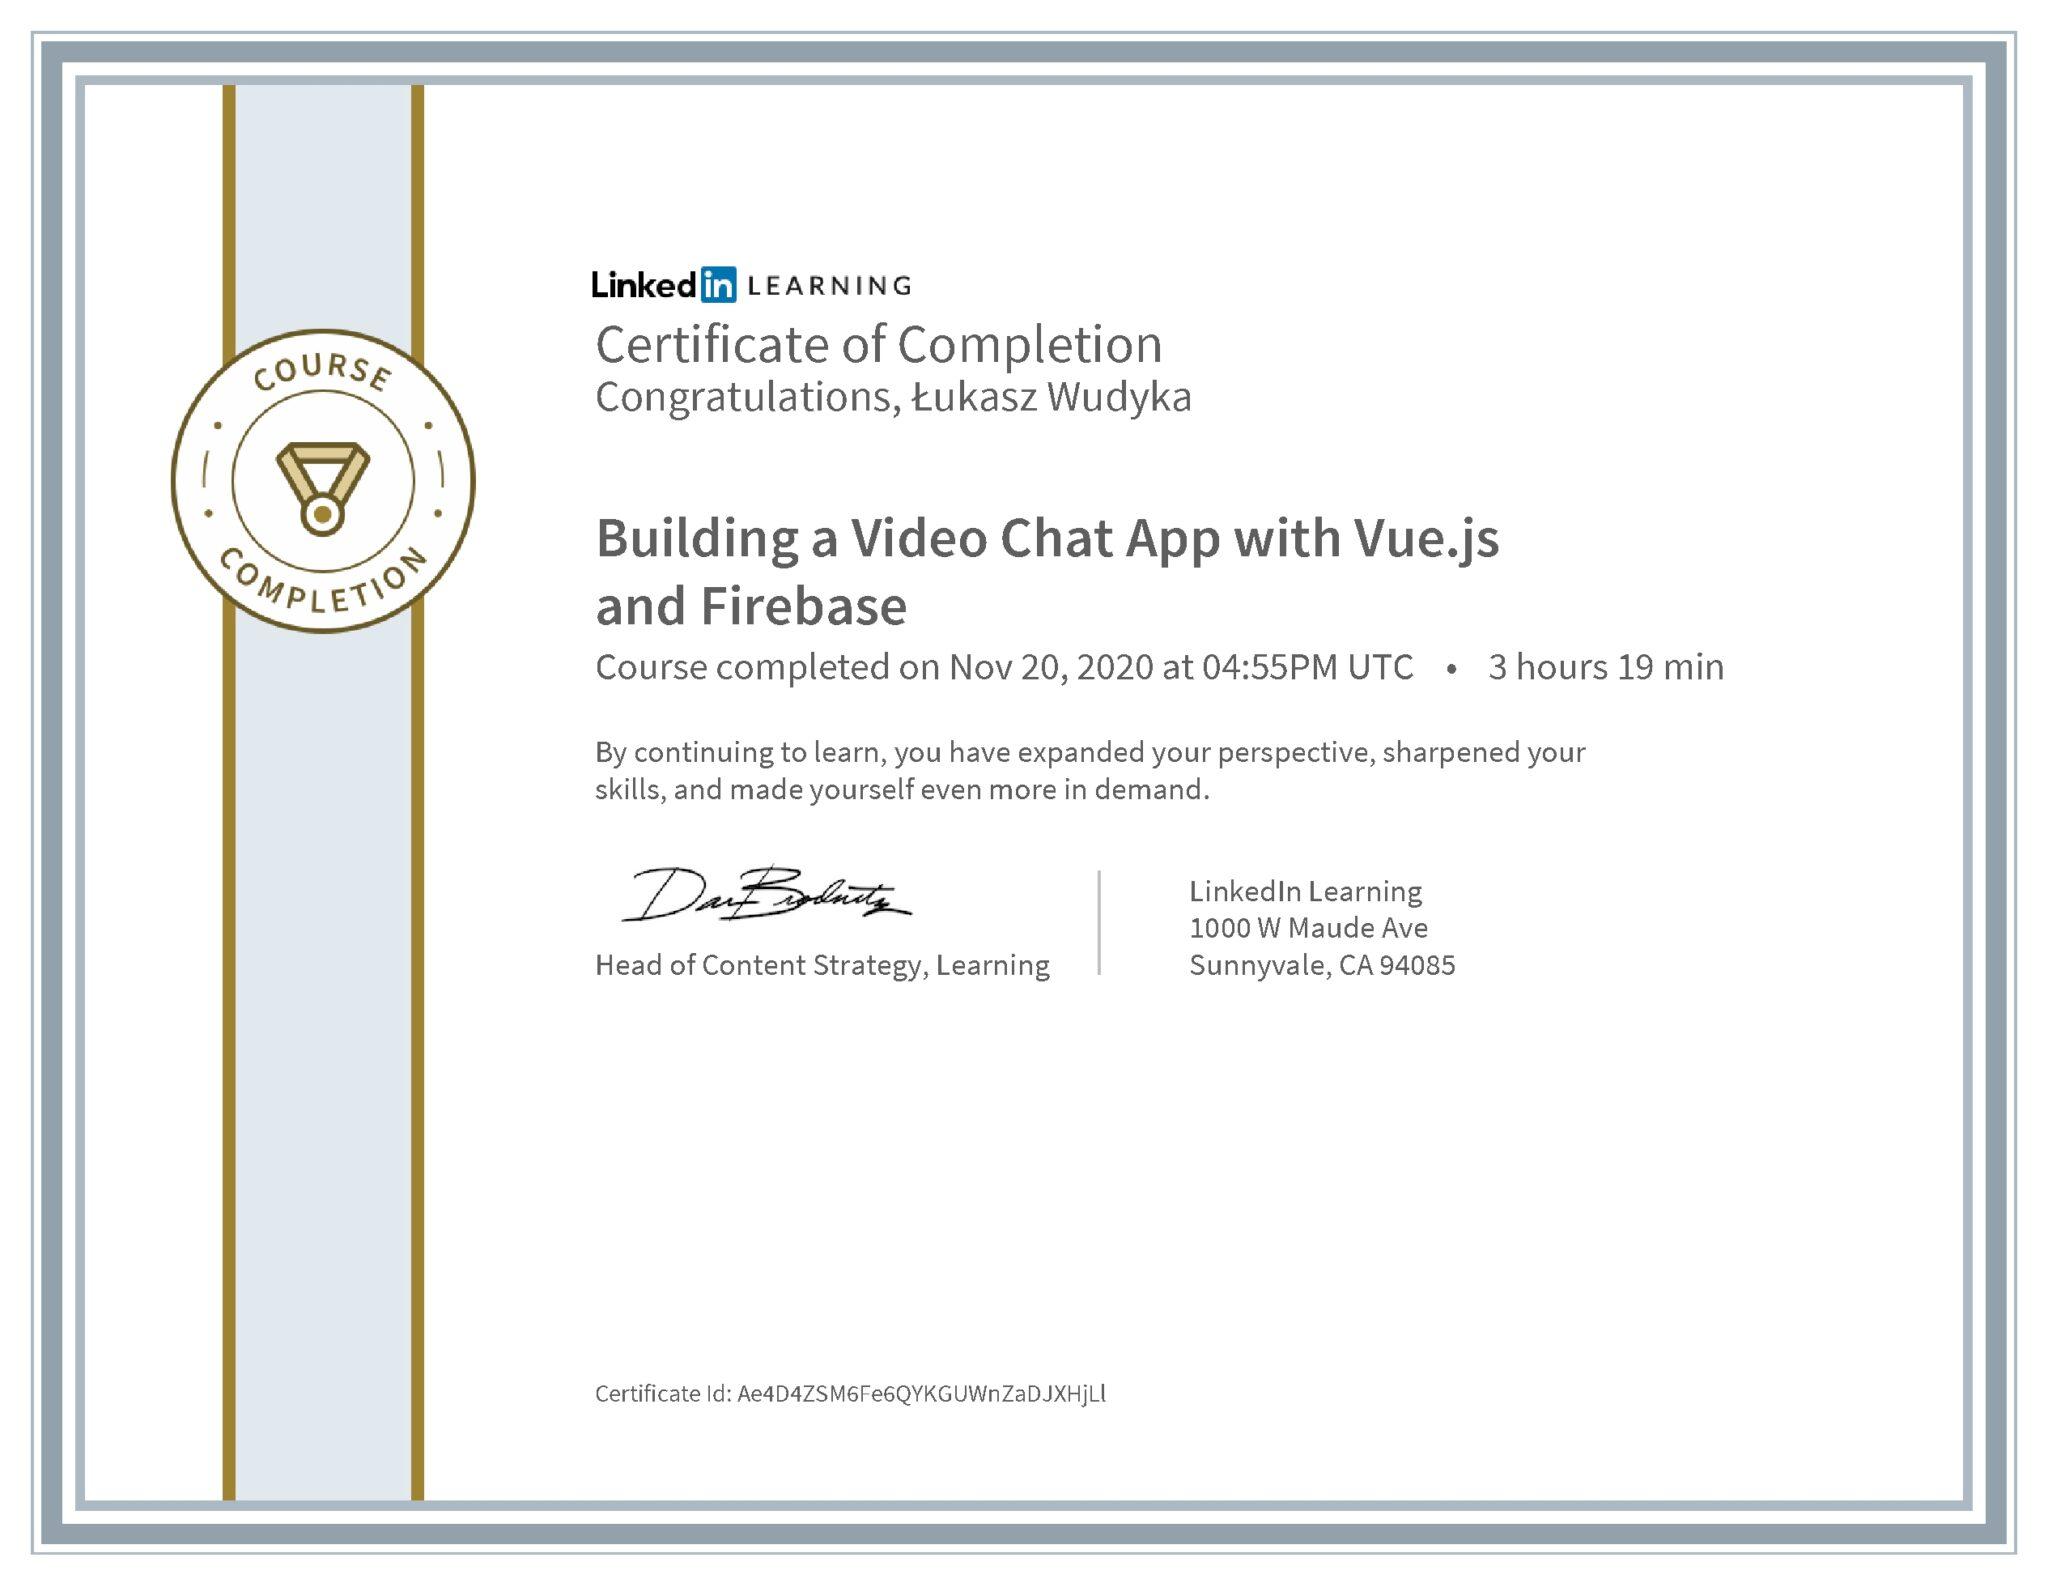 Łukasz Wudyka certyfikat LinkedIn Building a Video Chat App with Vue.js and Firebase